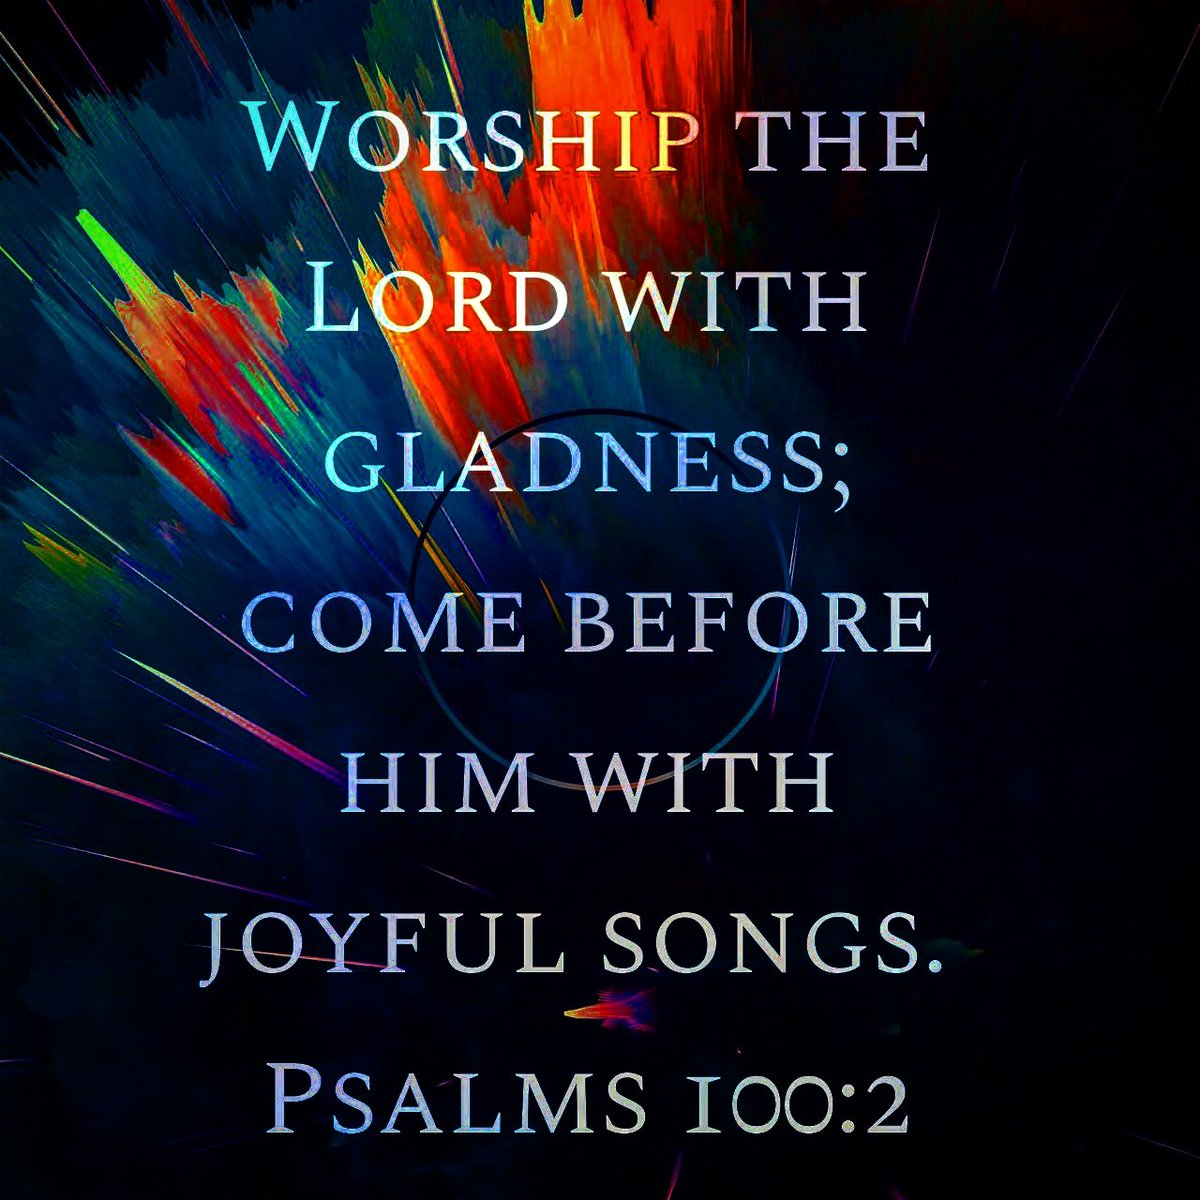 #Jesus #loves #you #Yeshua #yeshuahamashiach #God #Holy #Messiah #Joy #verseoftheday #votd #Truth #Word #words of #life #inspiration #Bible #inspiration #peace #hope #love #Bibleverse #scripture #Baruch #atah, #Adonai #Eloheinu, #Melech #haolampic.twitter.com/hIIpZCVAKe